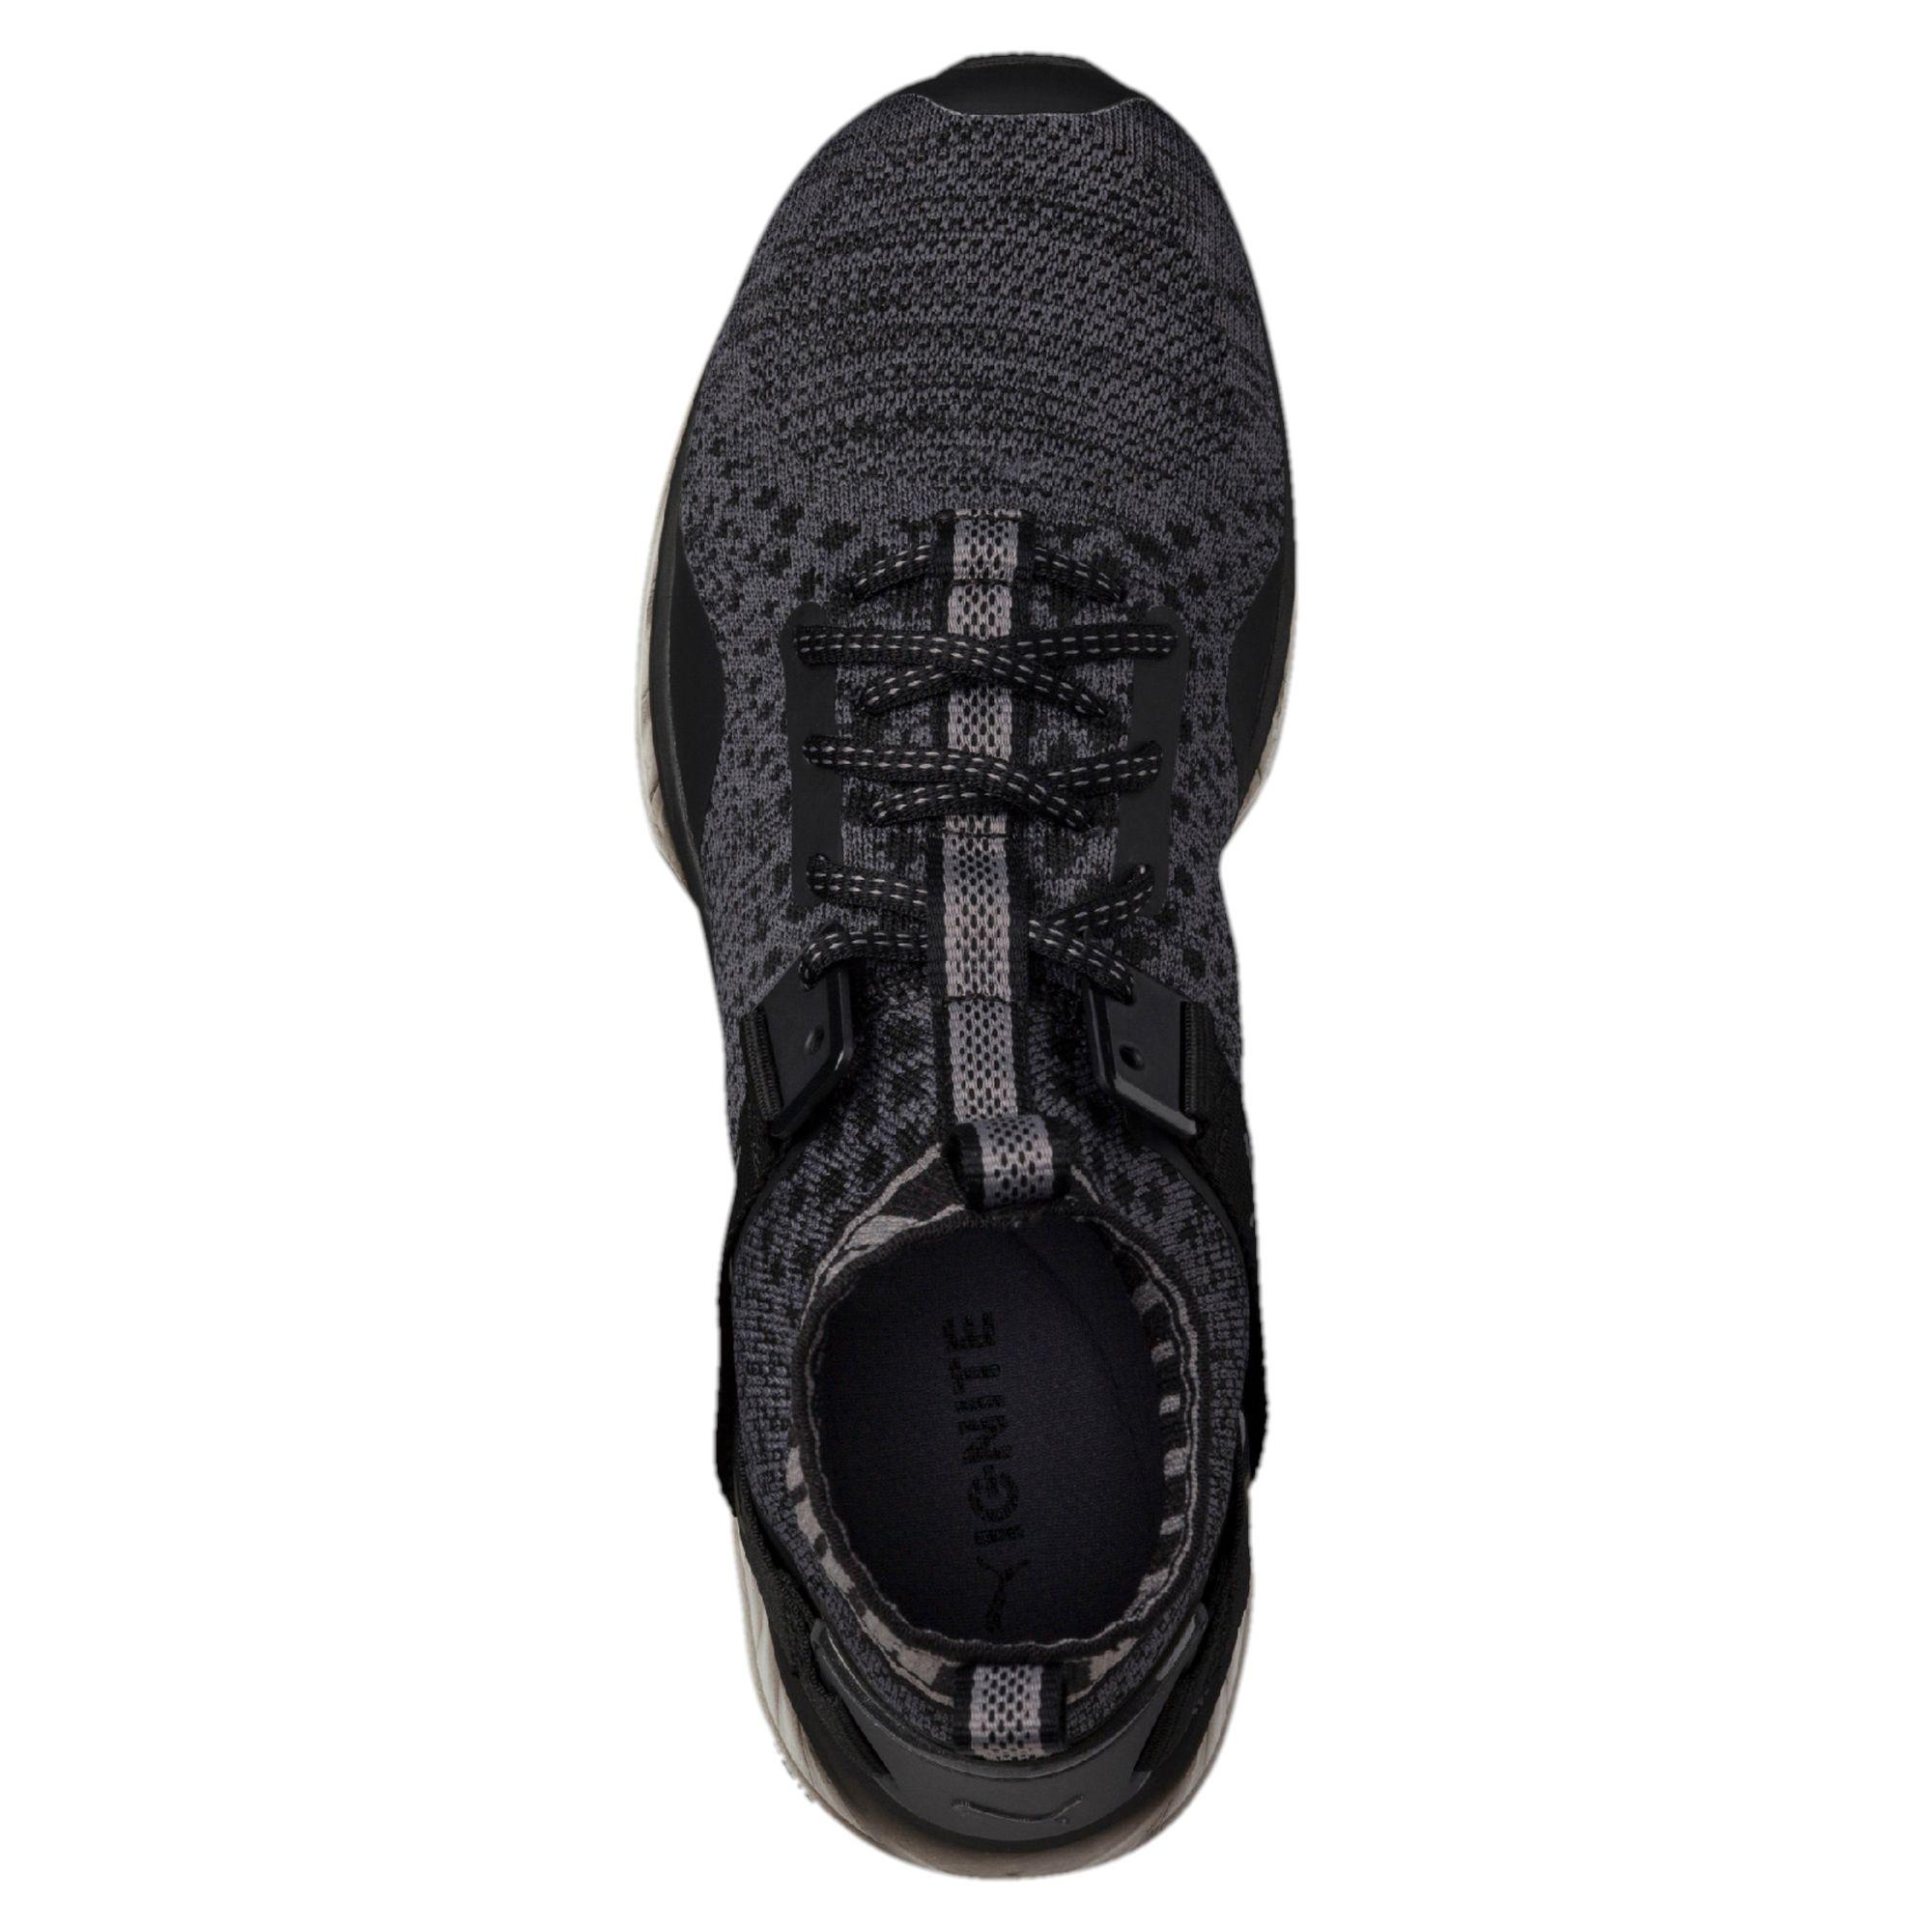 PUMA IGNITE evoKNIT Fade Herren Sneaker Männer Schuhe Laufen